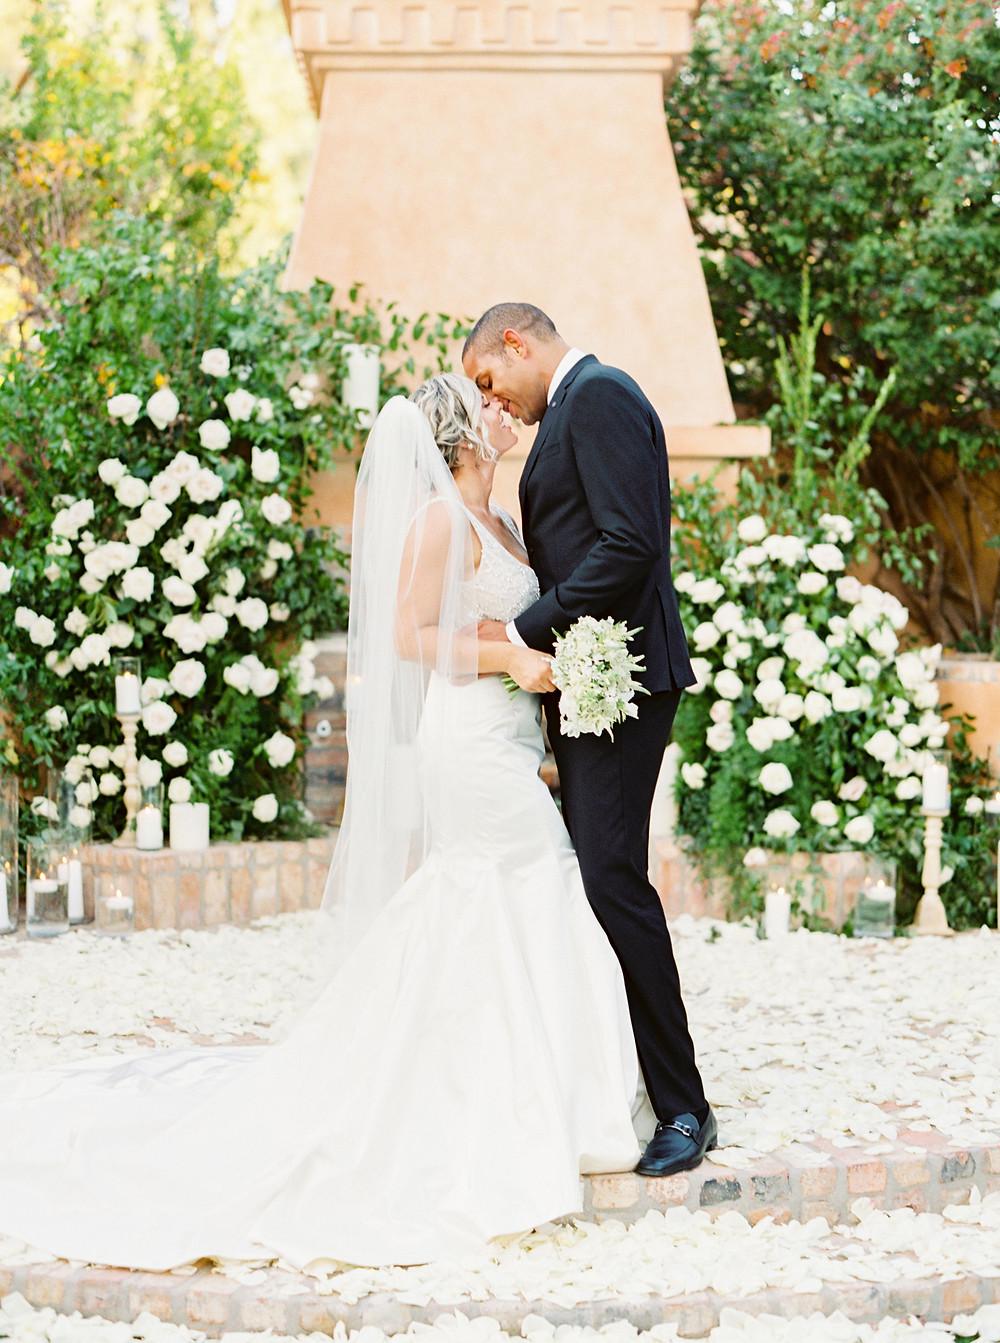 Royal Palms Wedding, Ceremony, Bride & Groom